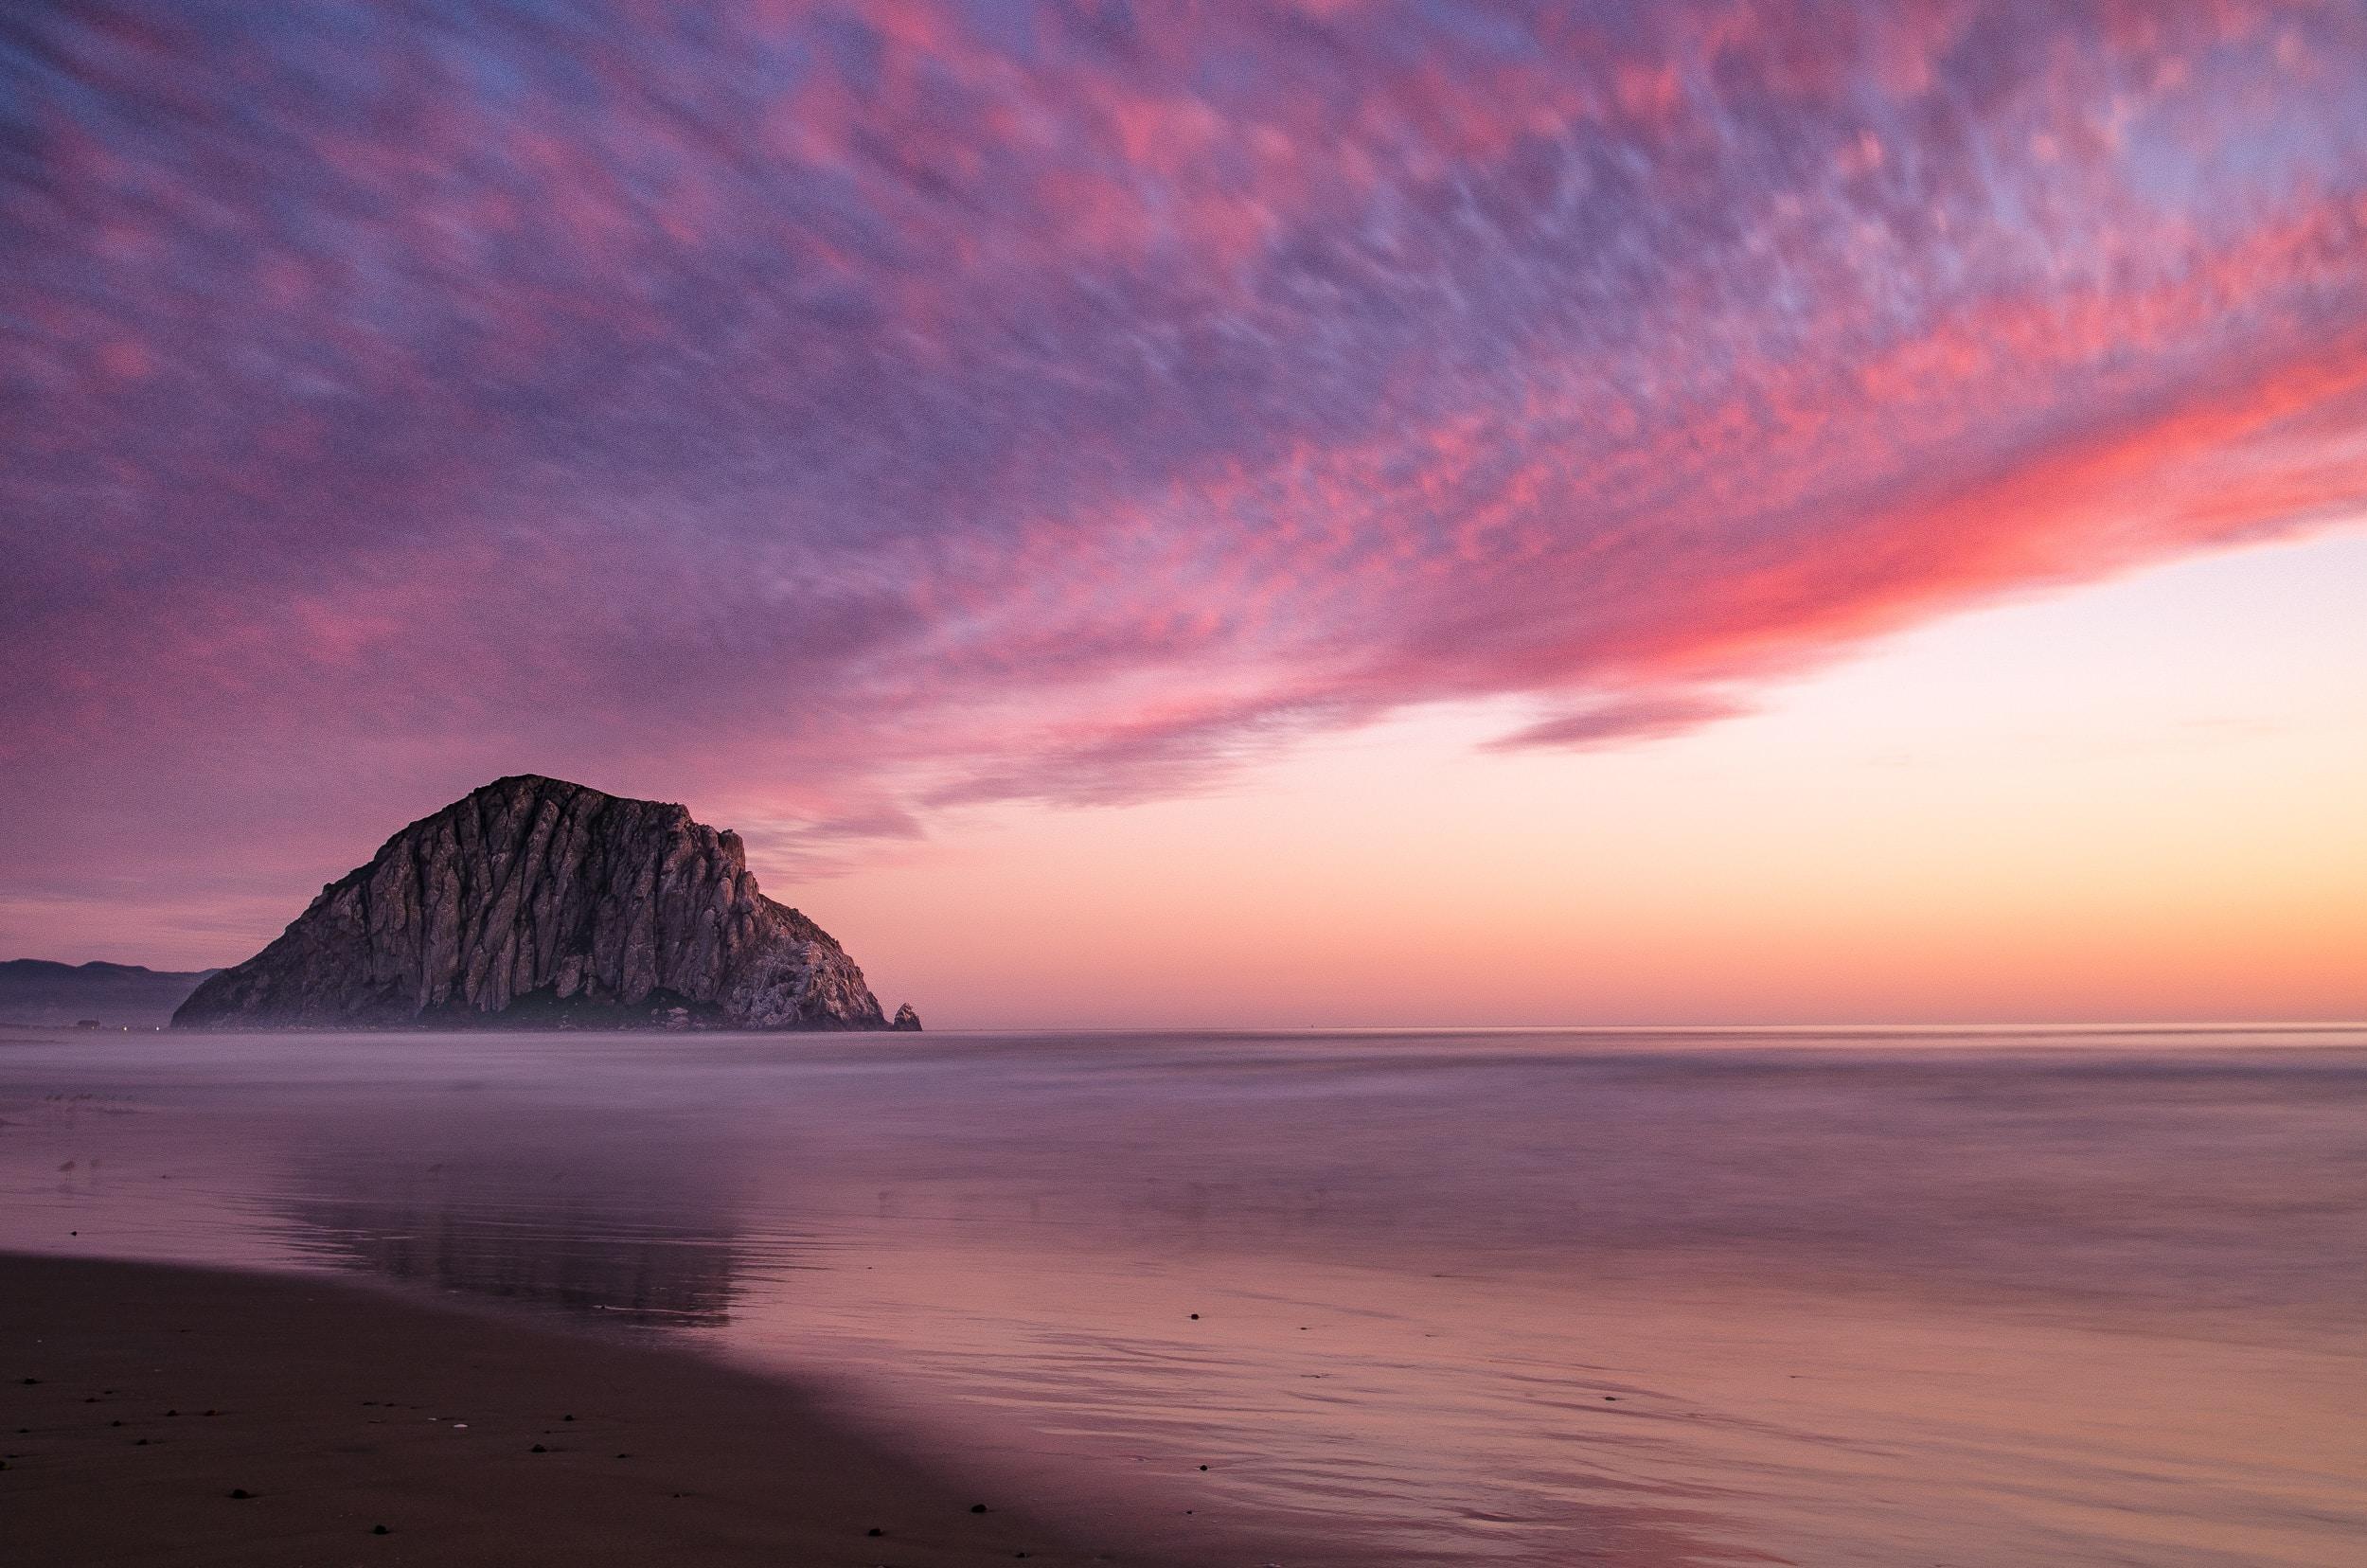 landscape photography of seashore near rock islet